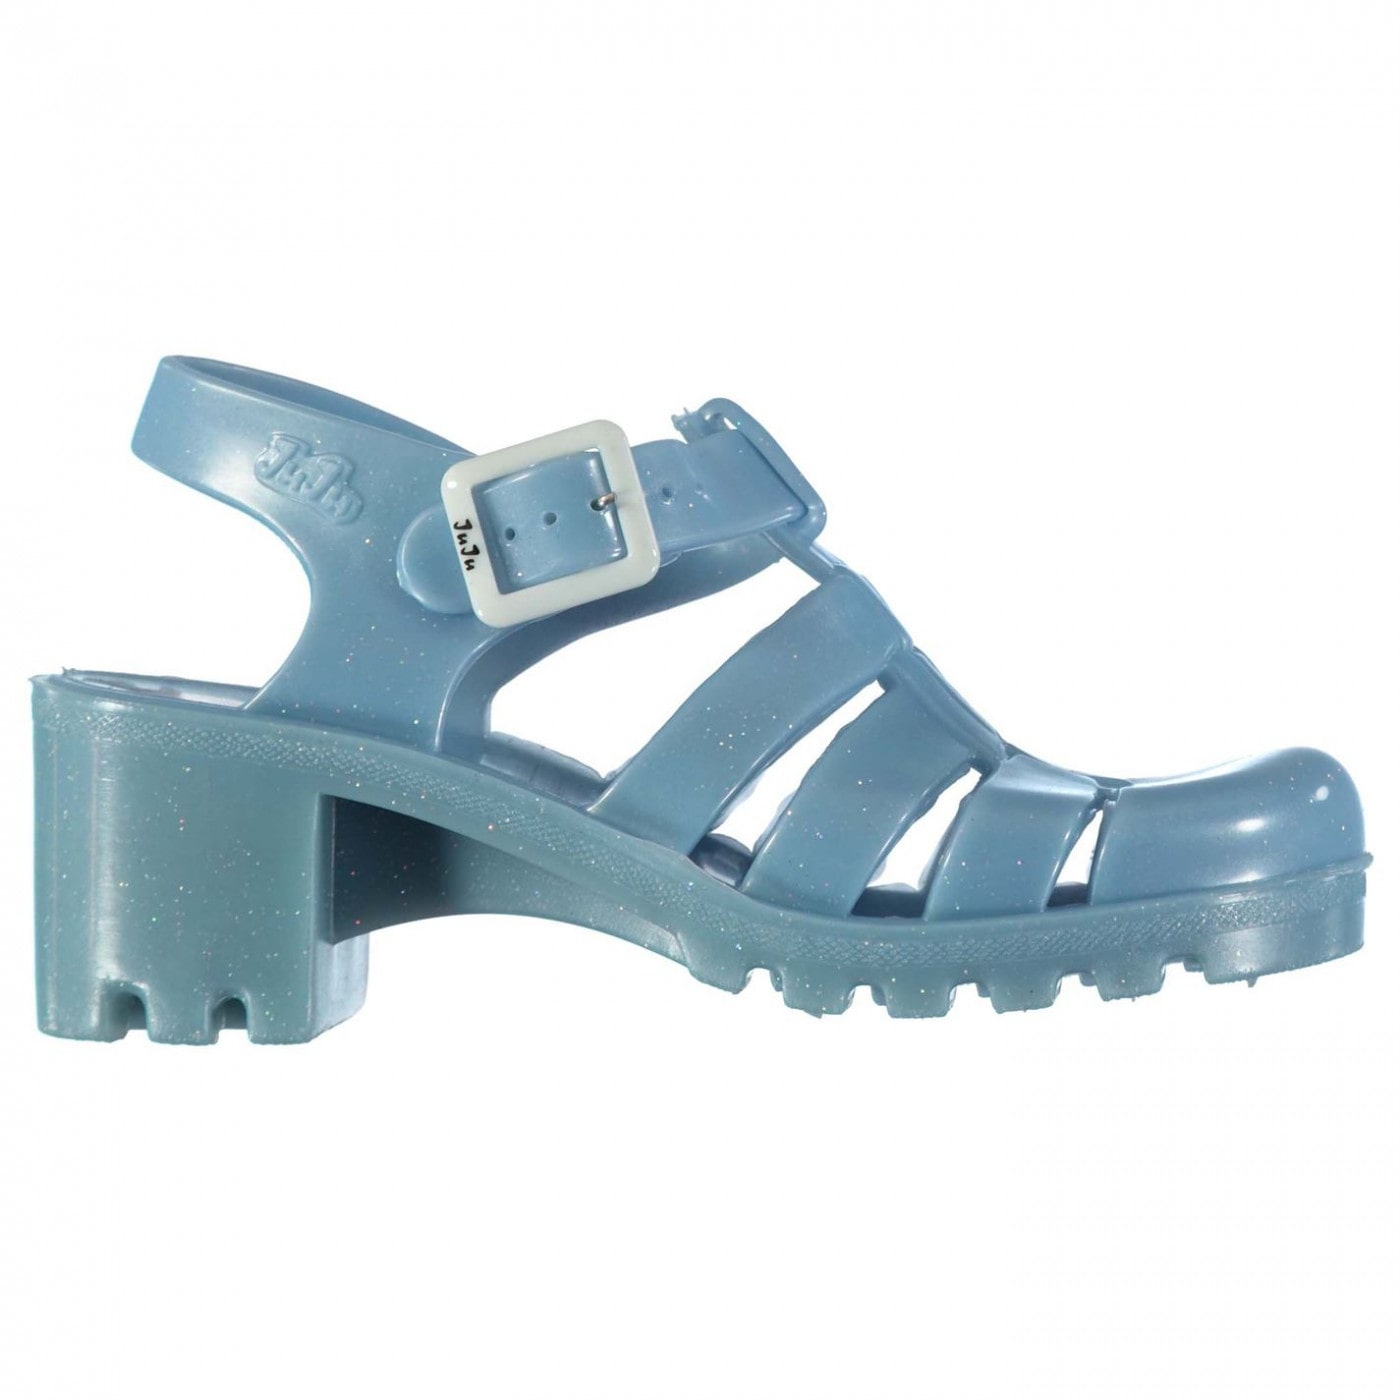 2ae88c2f132b Ženske sandale - FACTCOOL